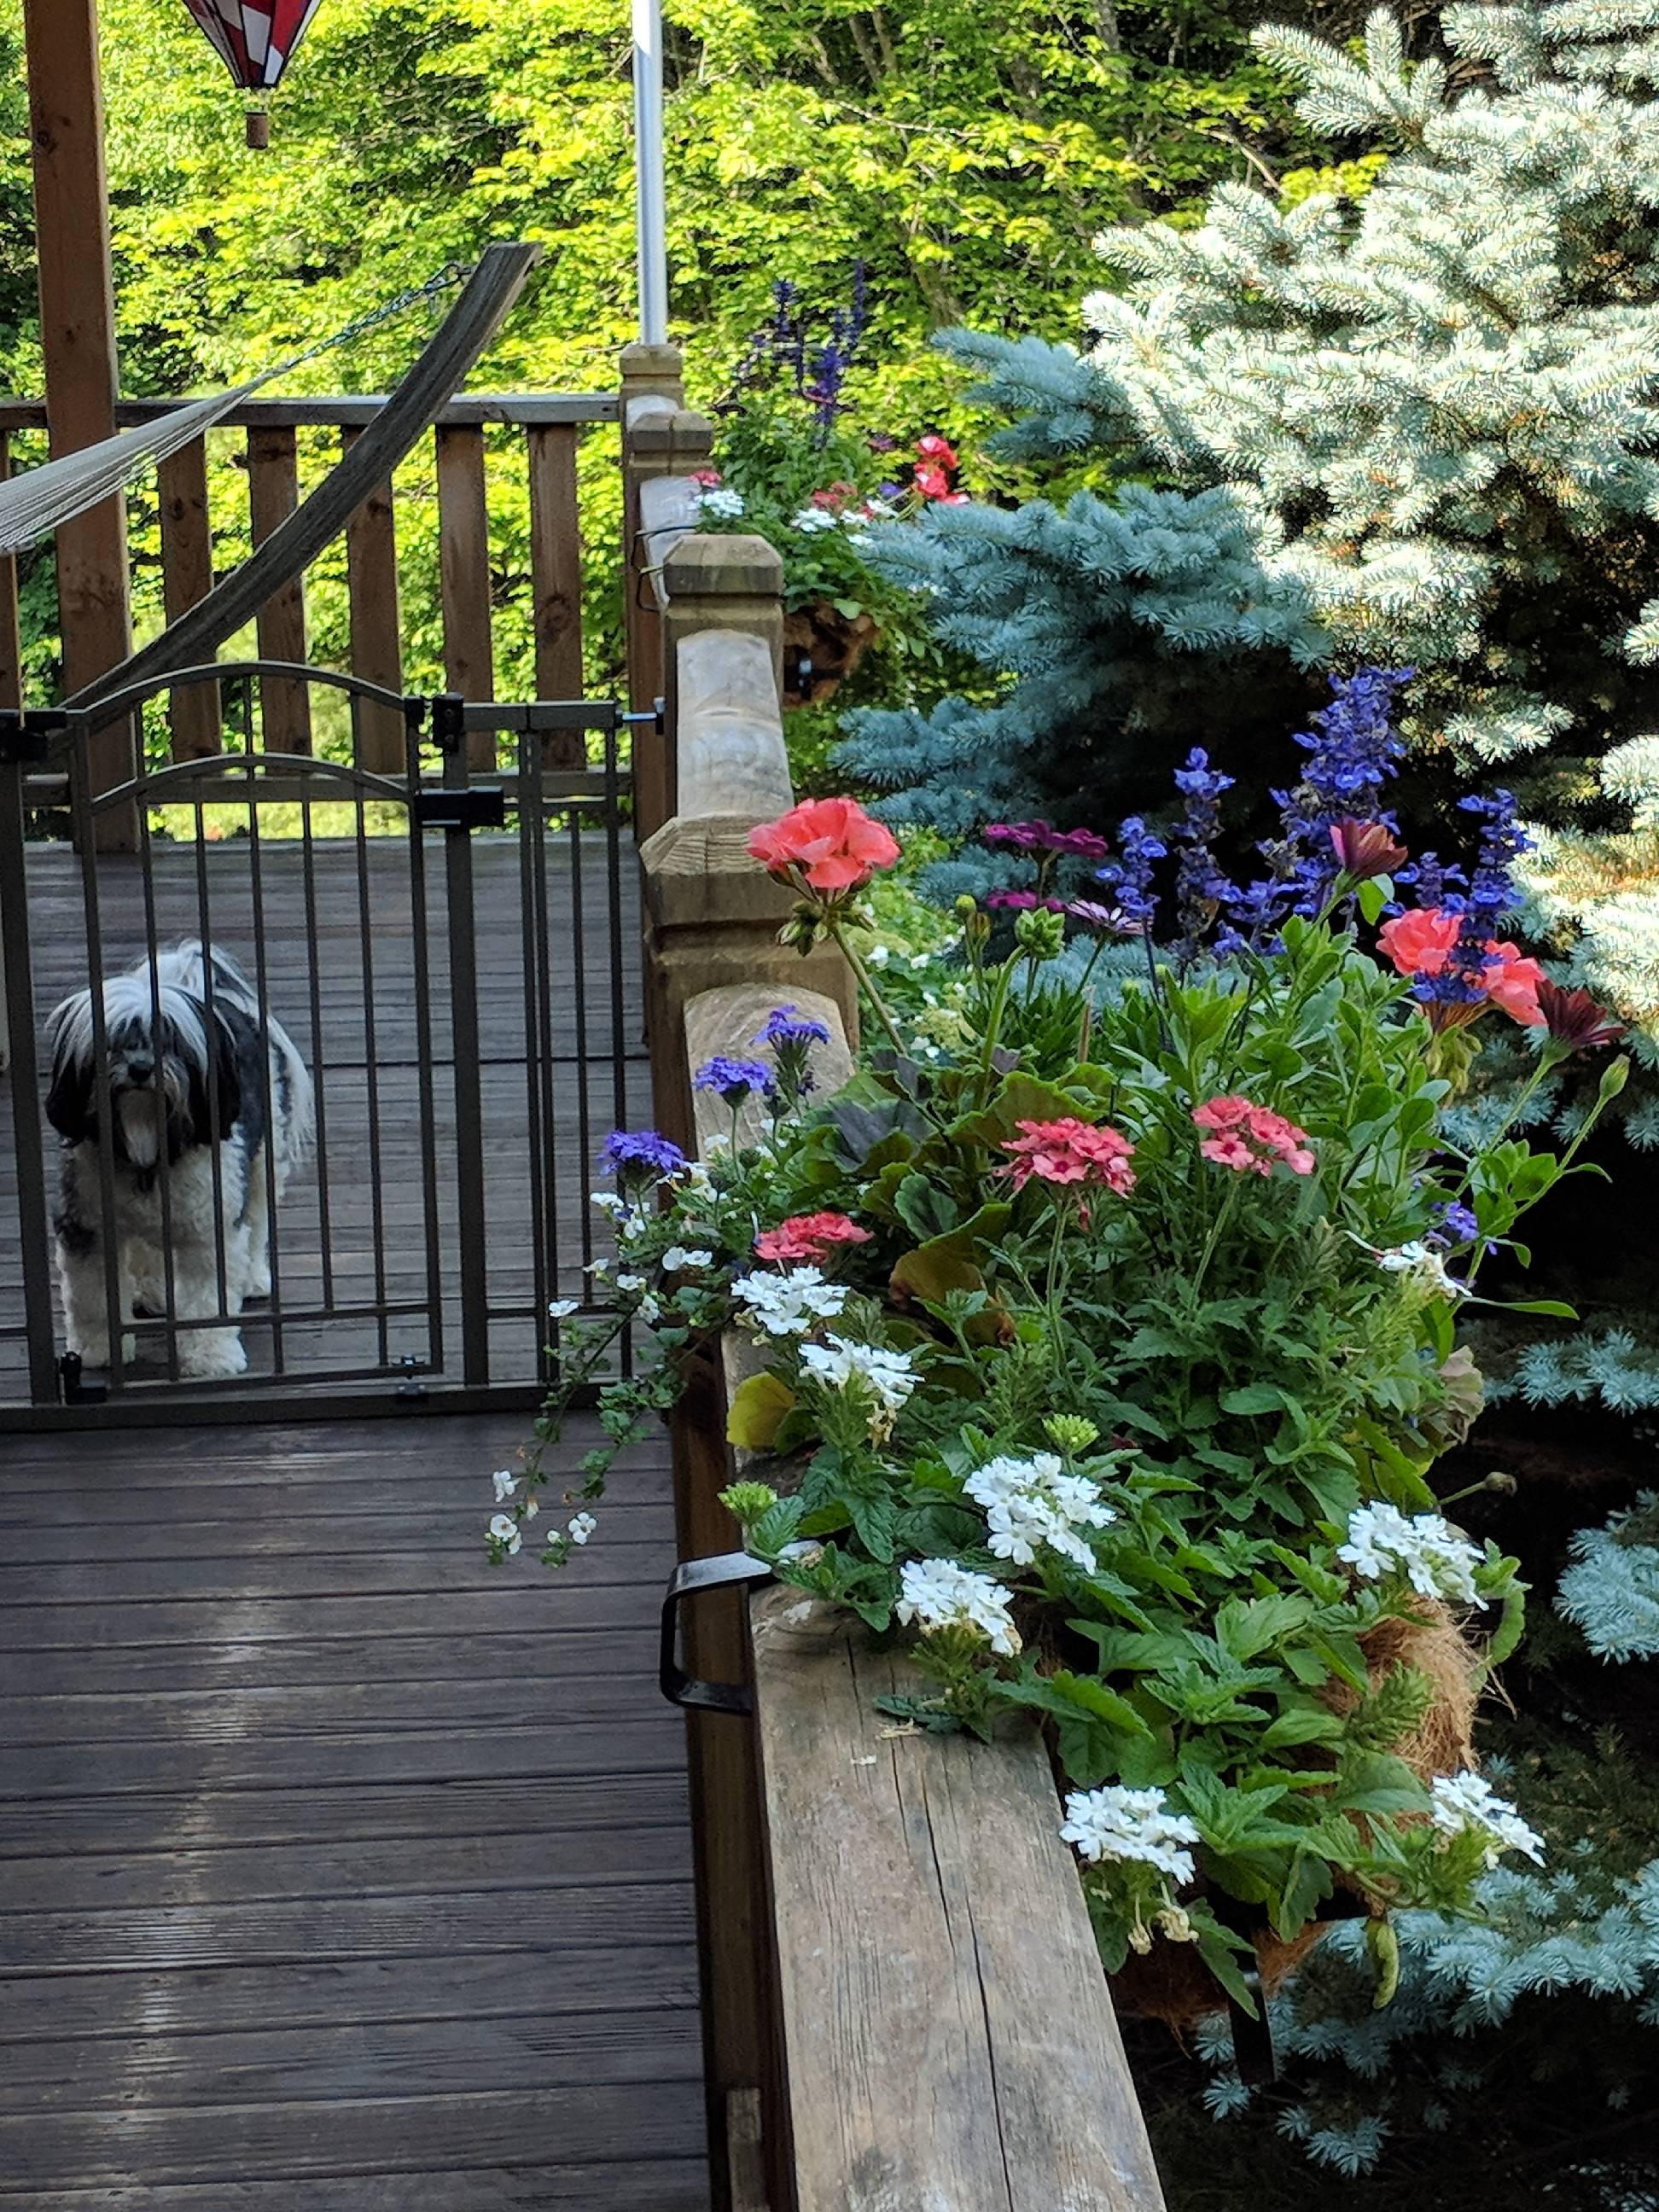 Yogi in summer 2018